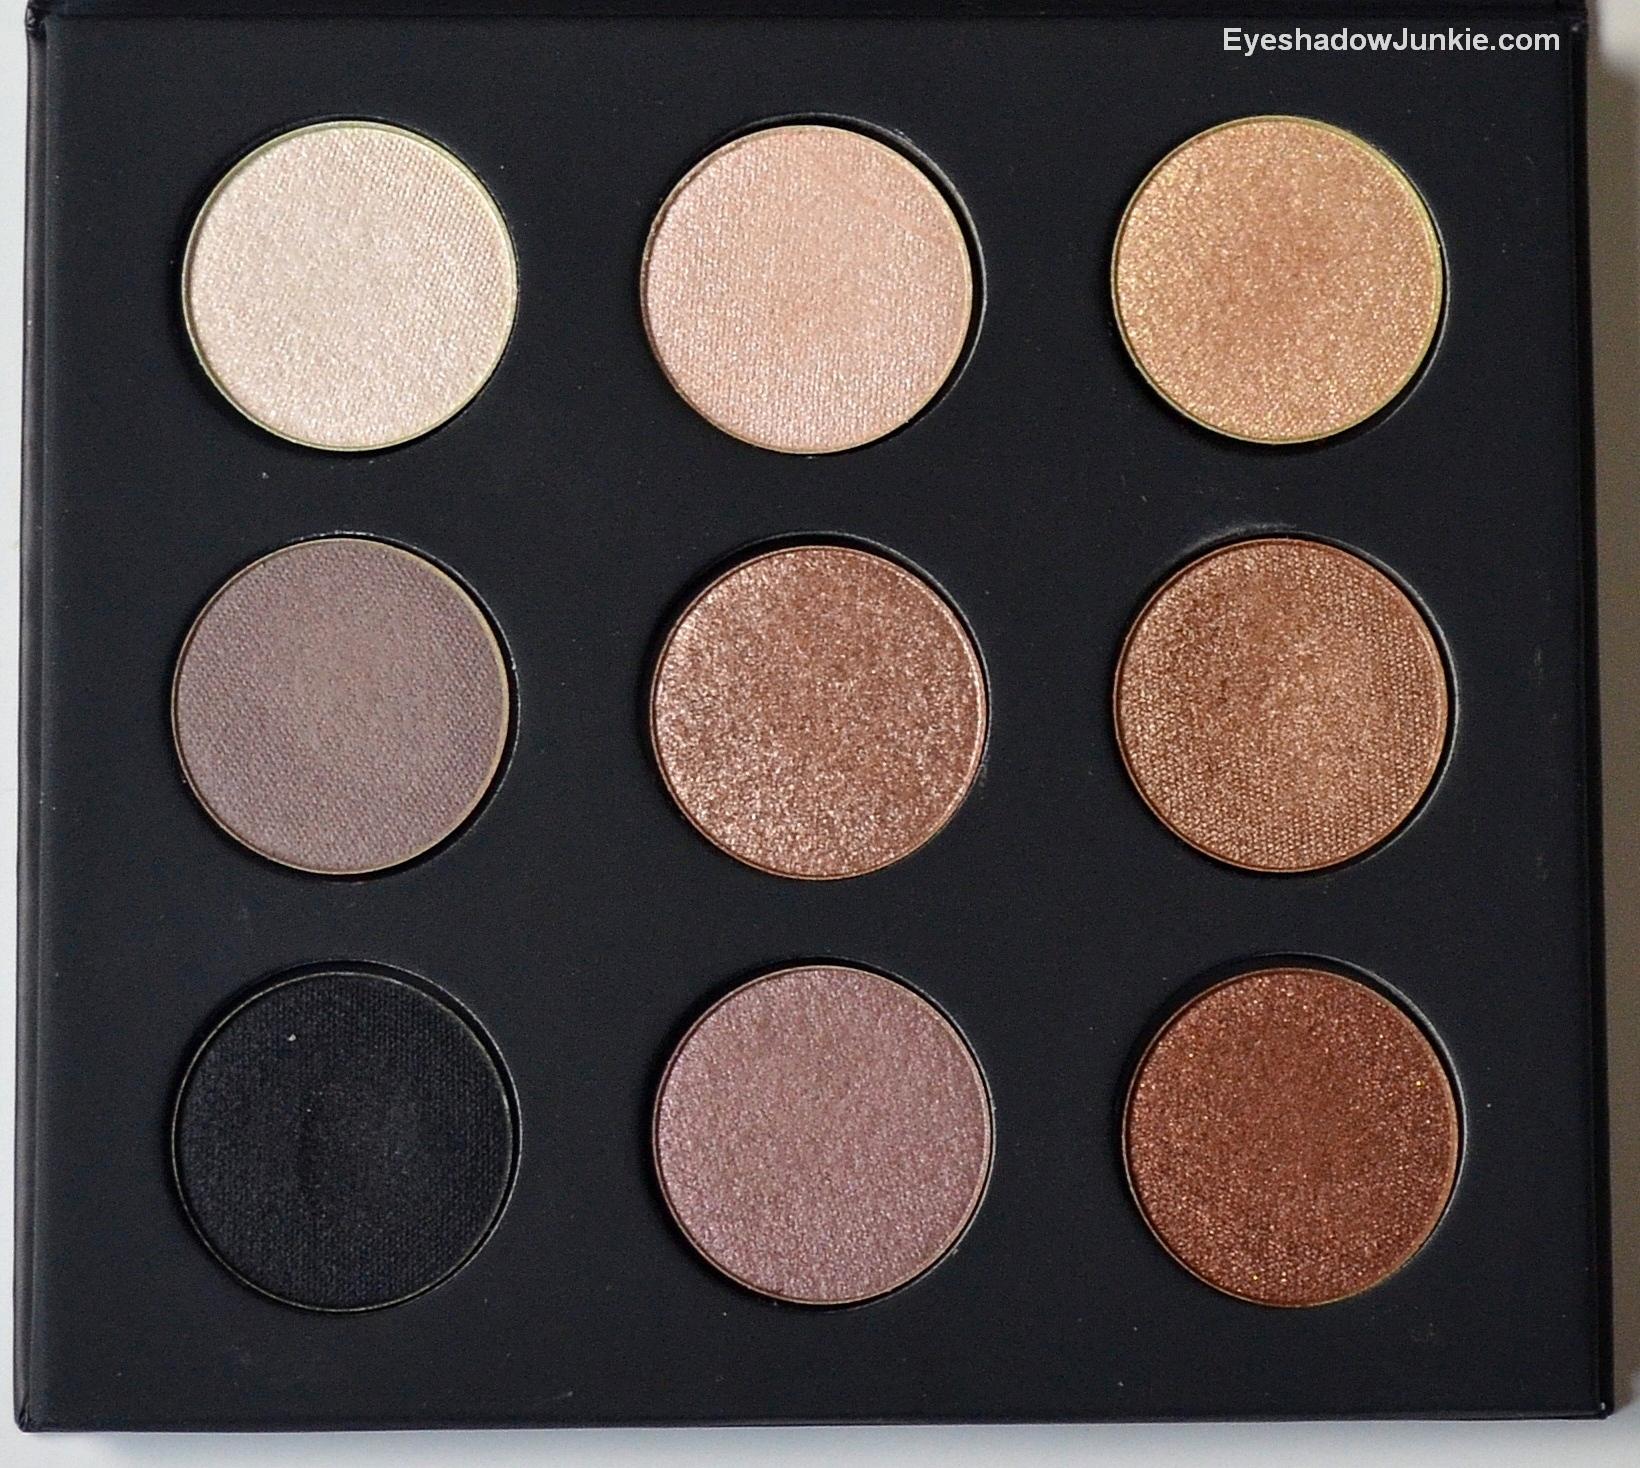 make up forever artist palette artistic eyeshadow junkie